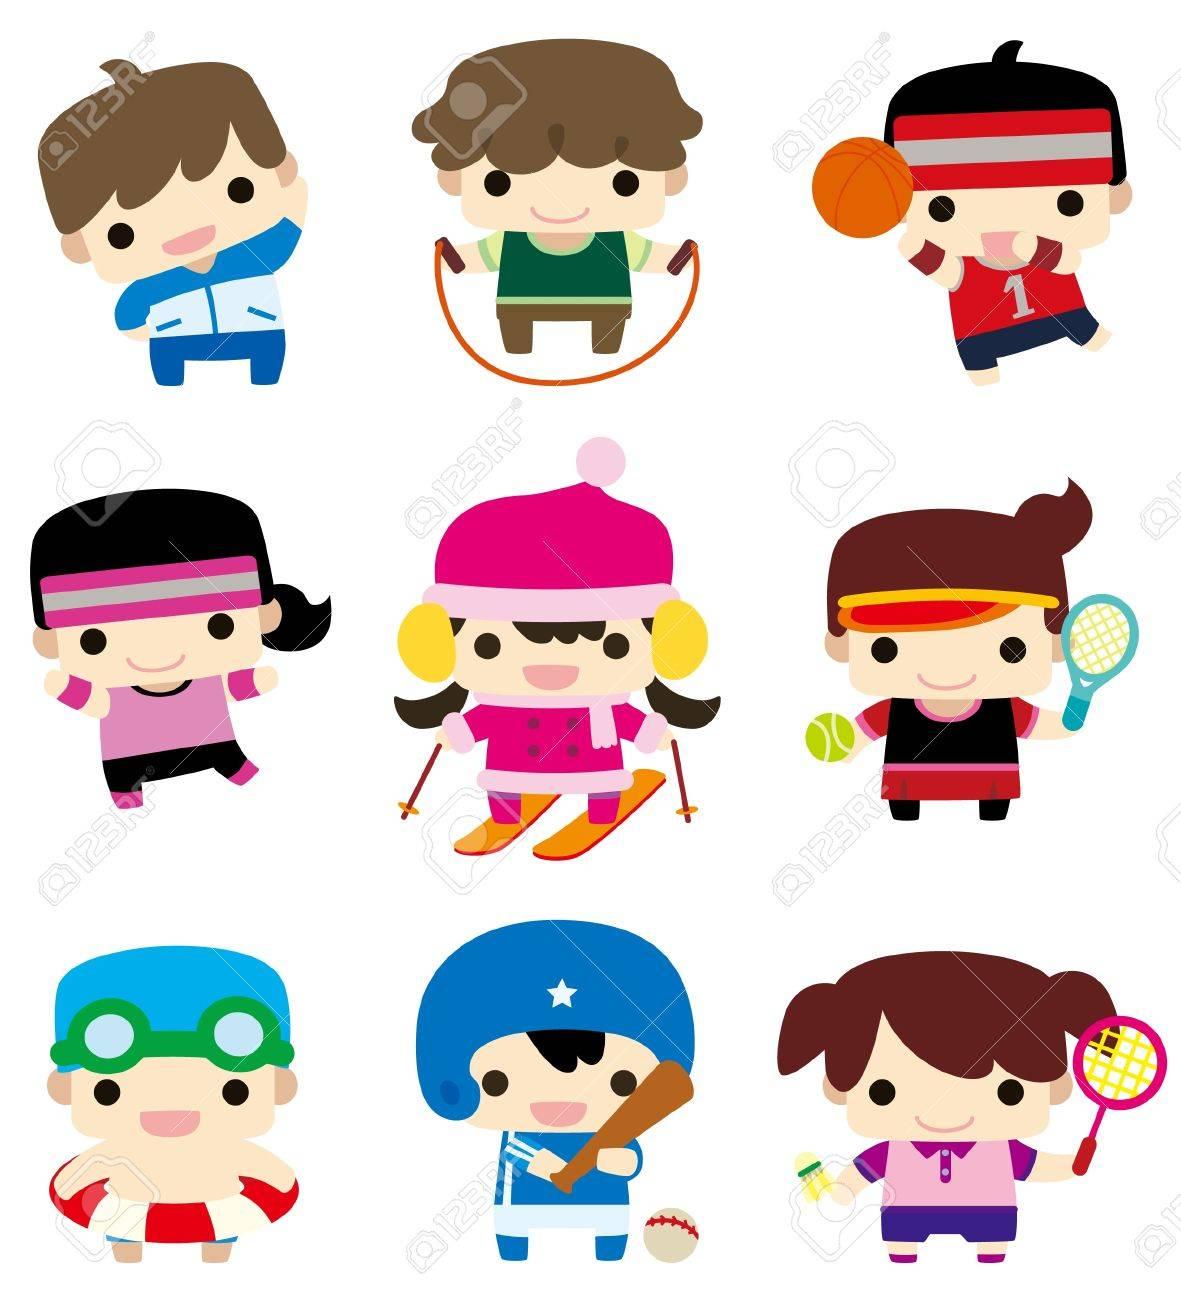 cartoon sport player icon Stock Vector - 9148259